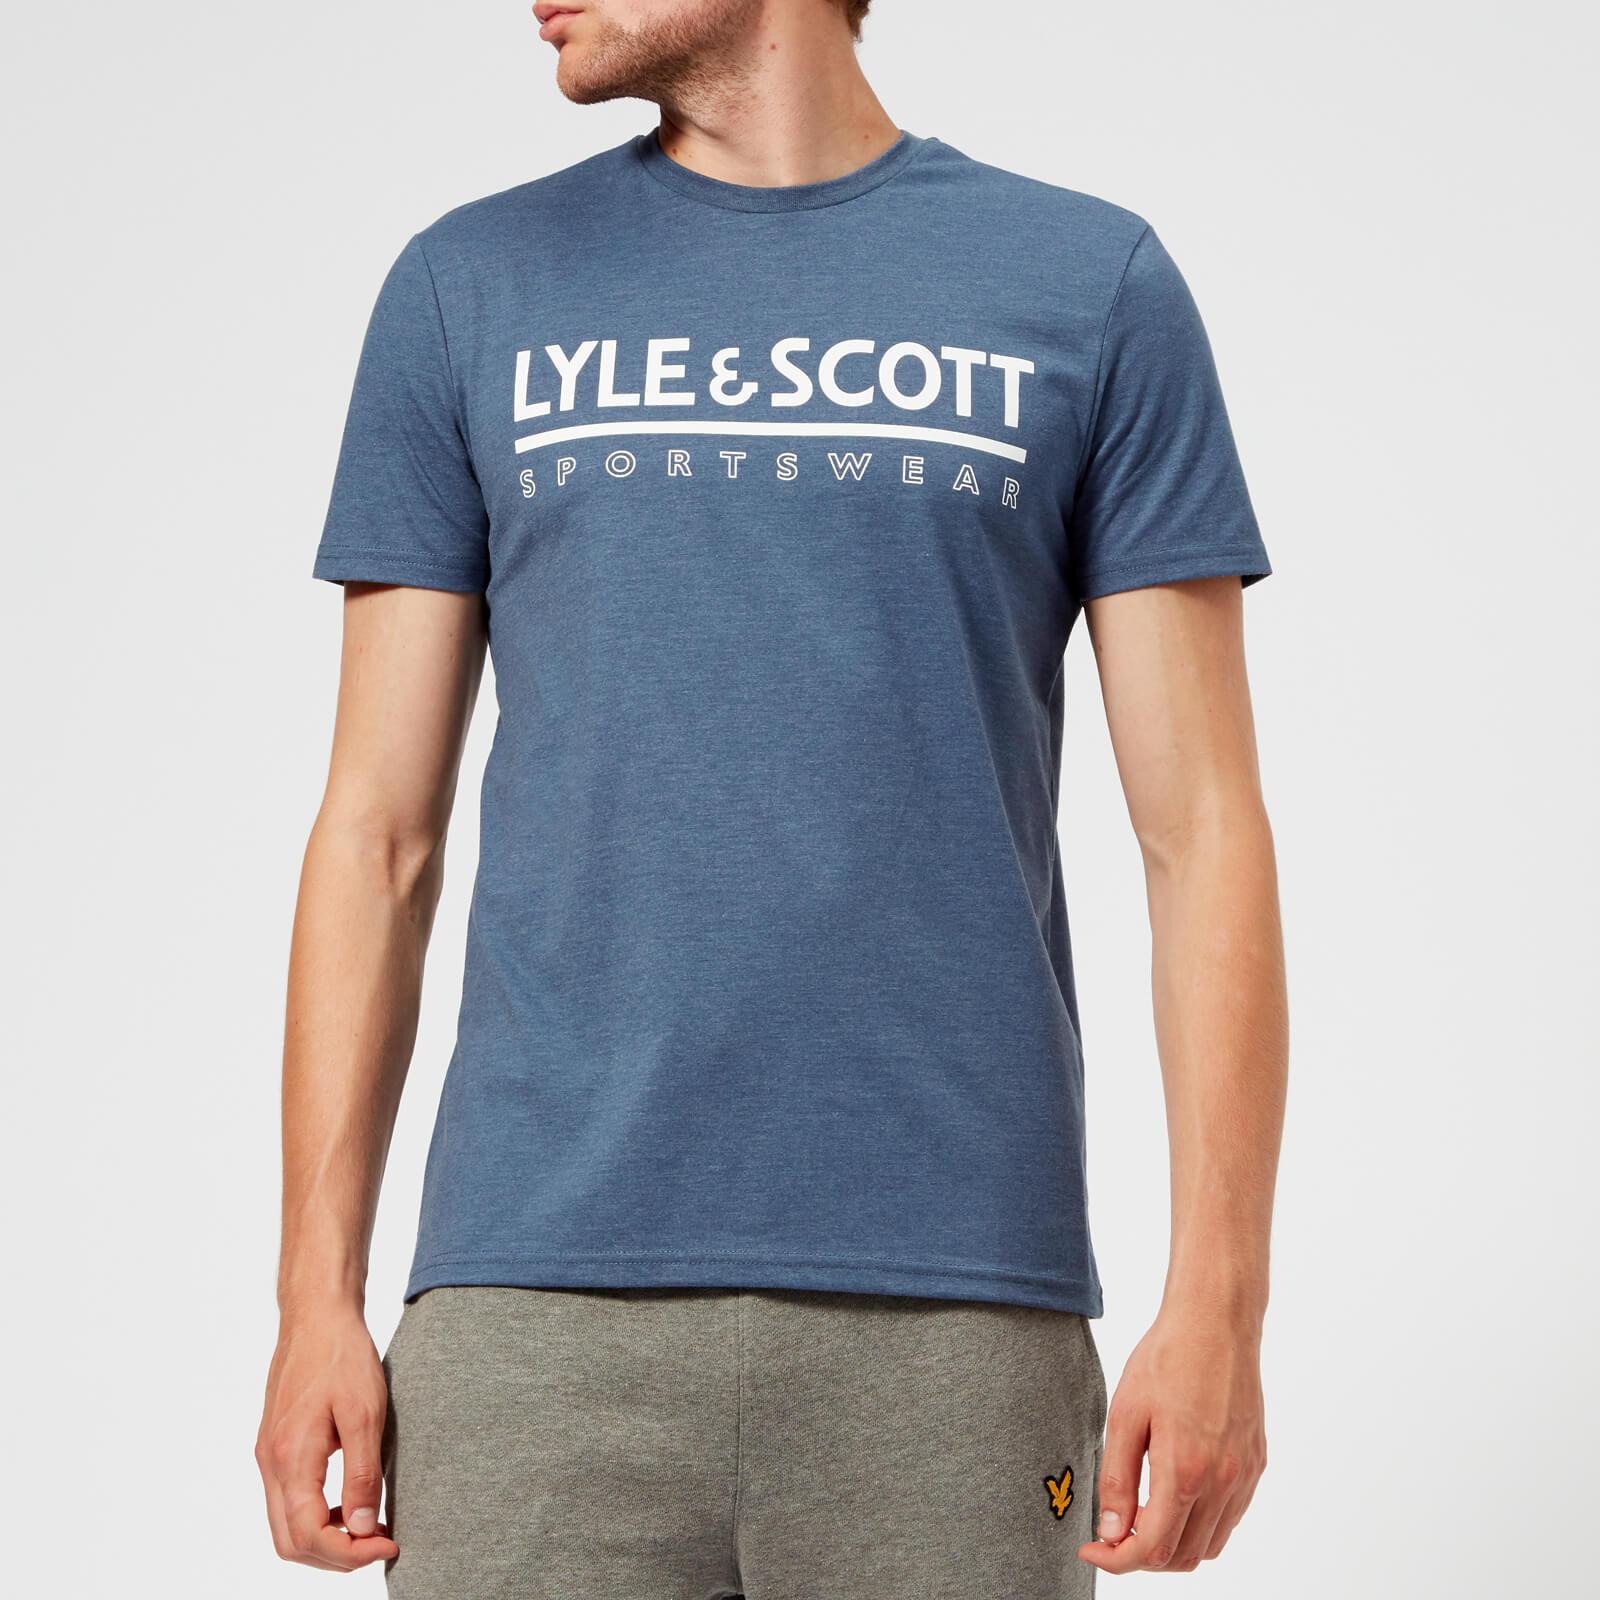 2812cdb75 Lyle & Scott Harridge Short Sleeve Large Logo T-shirt in Blue for ...